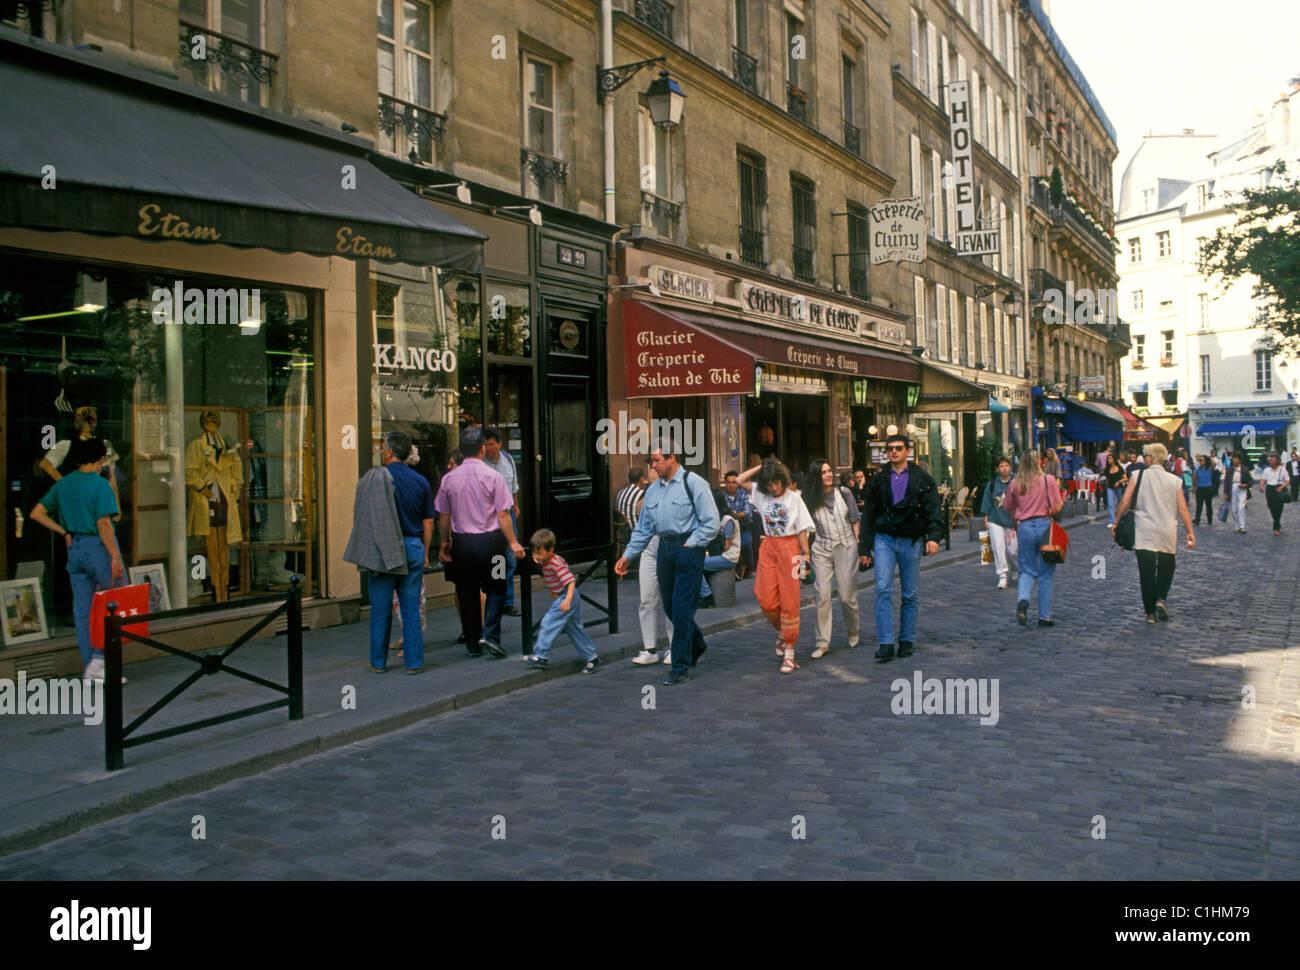 French people, tourists, restaurants, French food and drink, Rue de Harpe, Saint-Michel, Latin Quarter, Paris, Ile Stock Photo